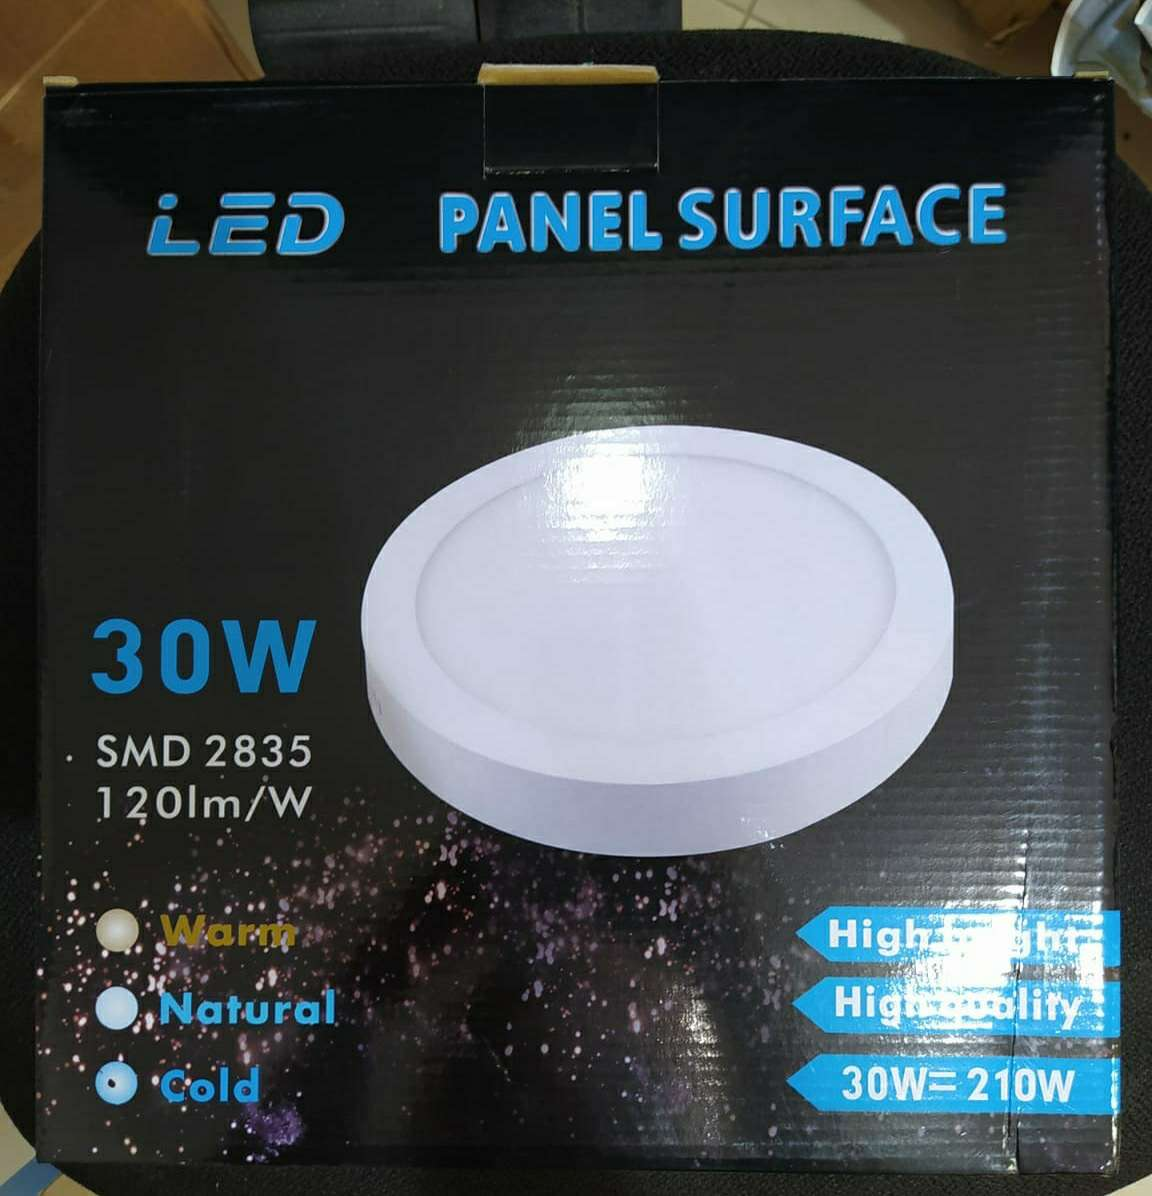 Imagen Panel surface